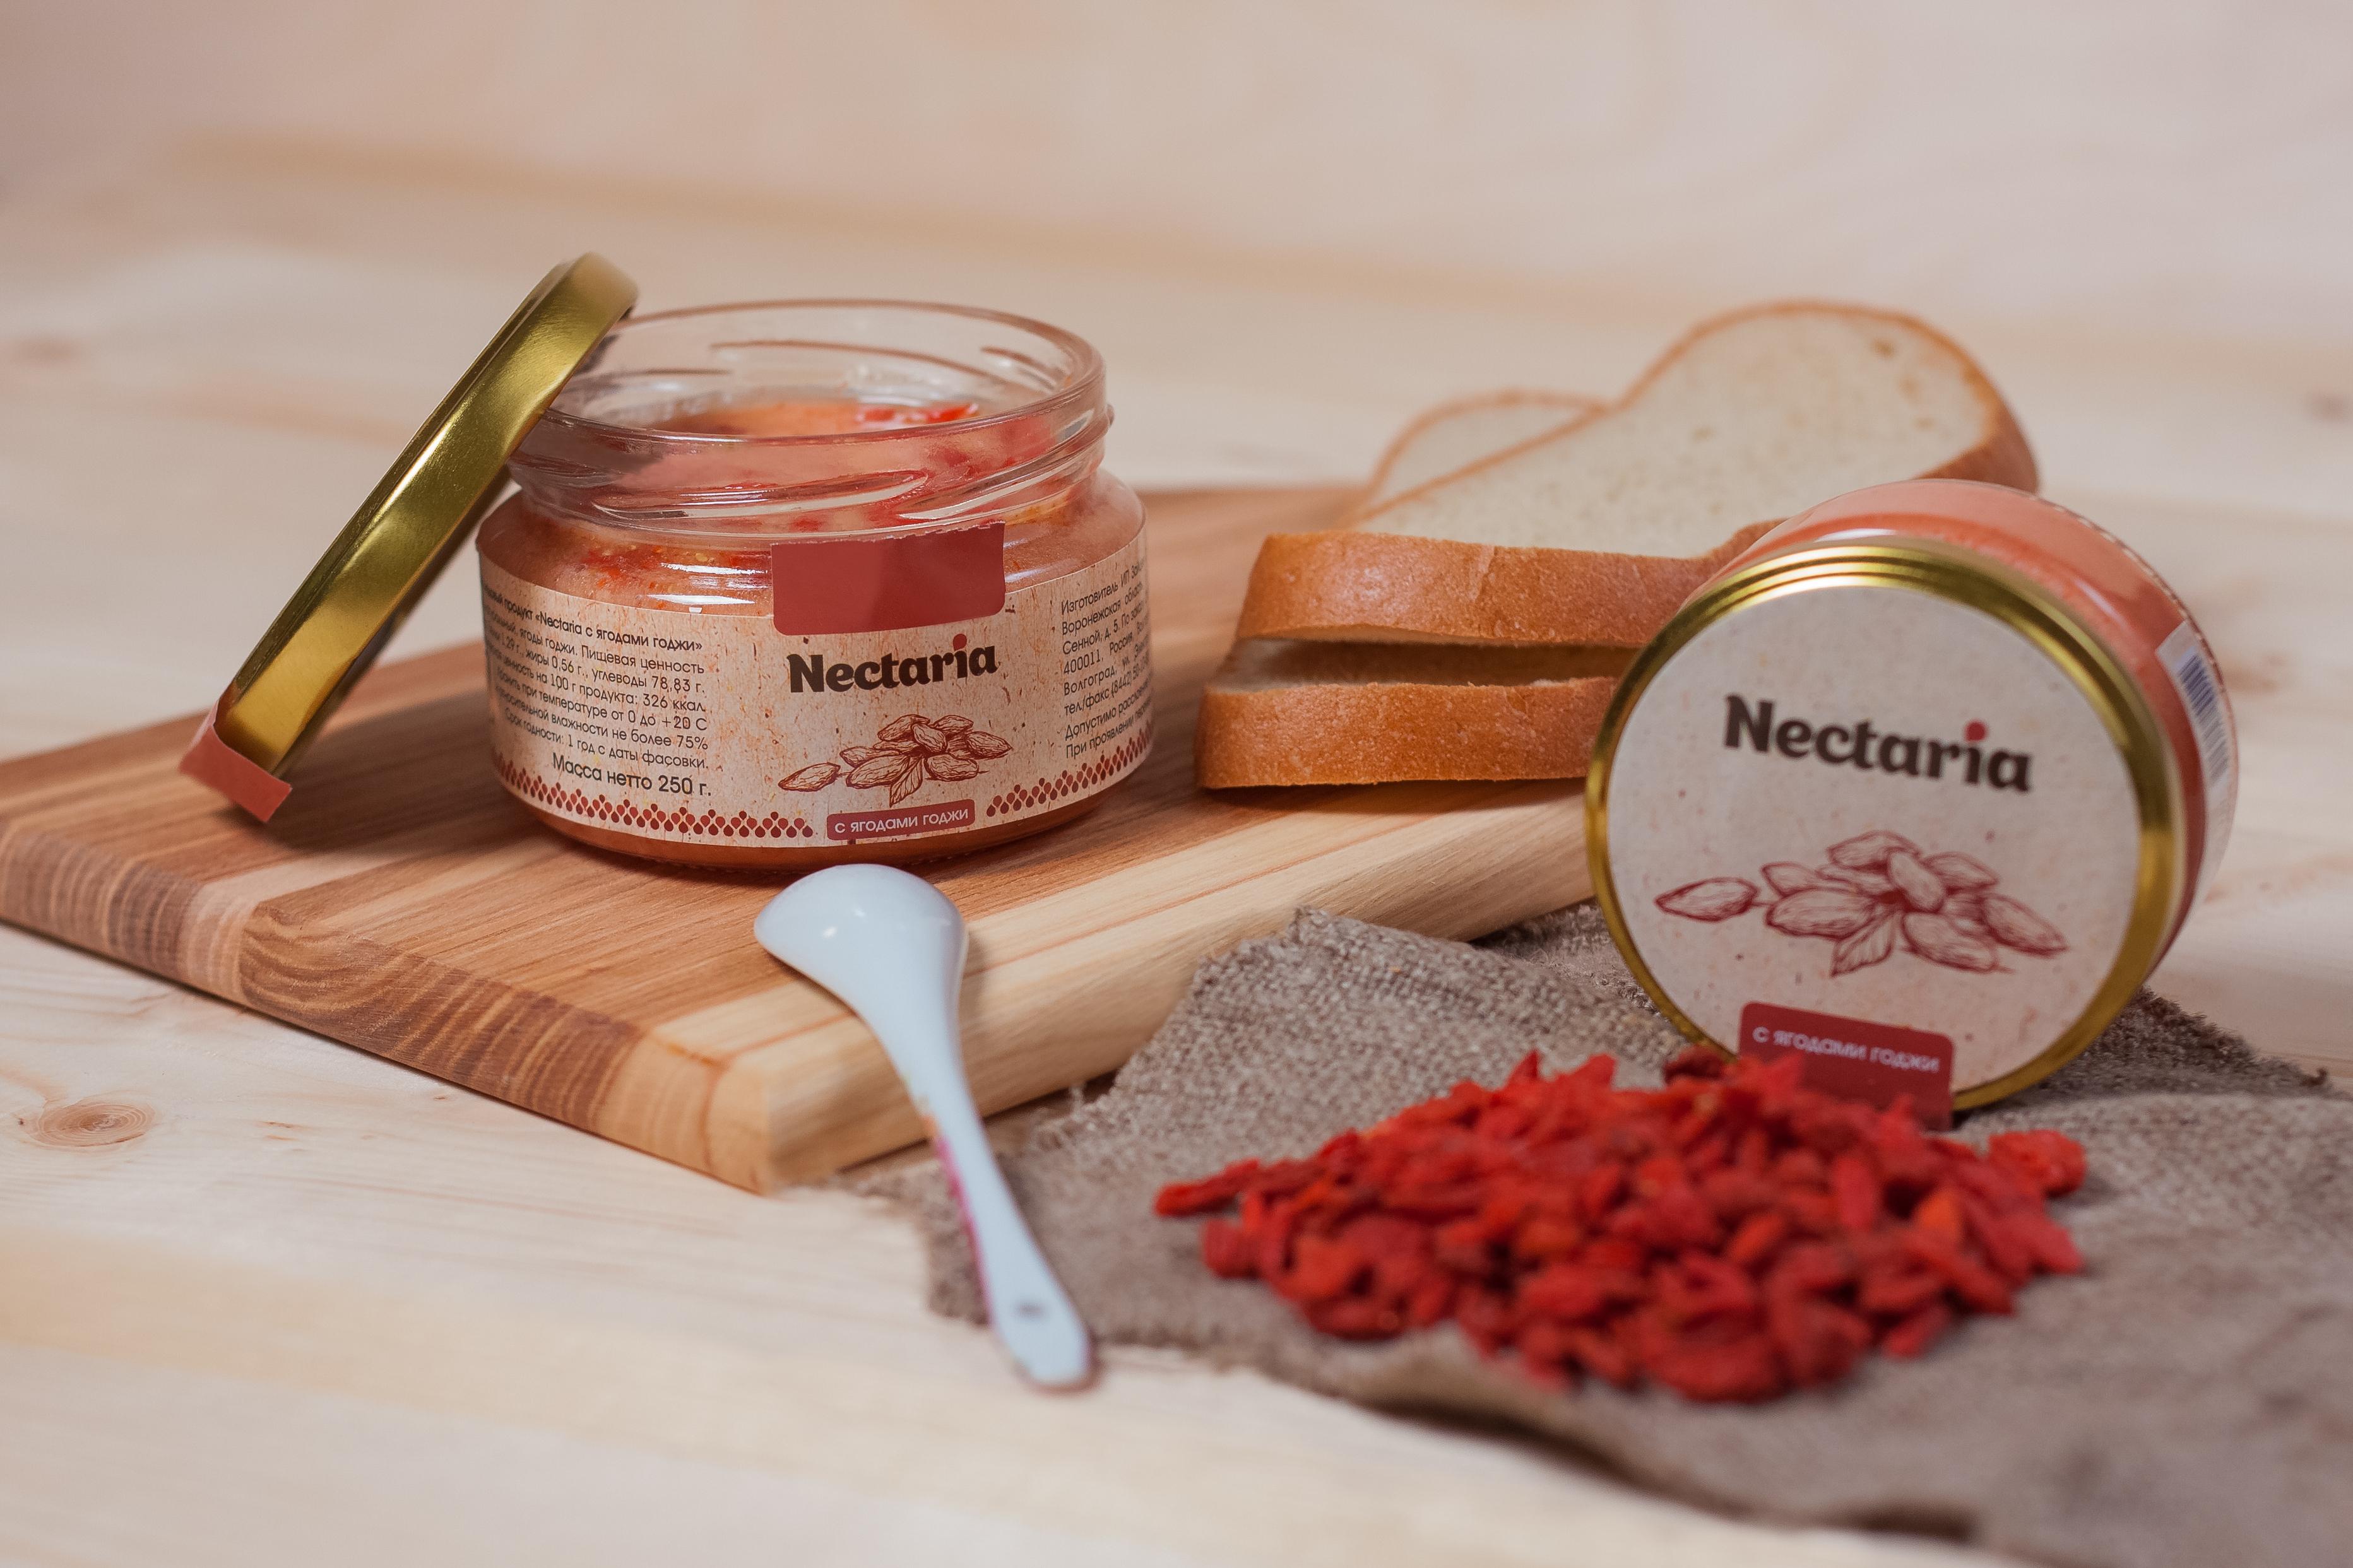 ���� �������. ���������� ������-������� ��������� �� Nectaria!